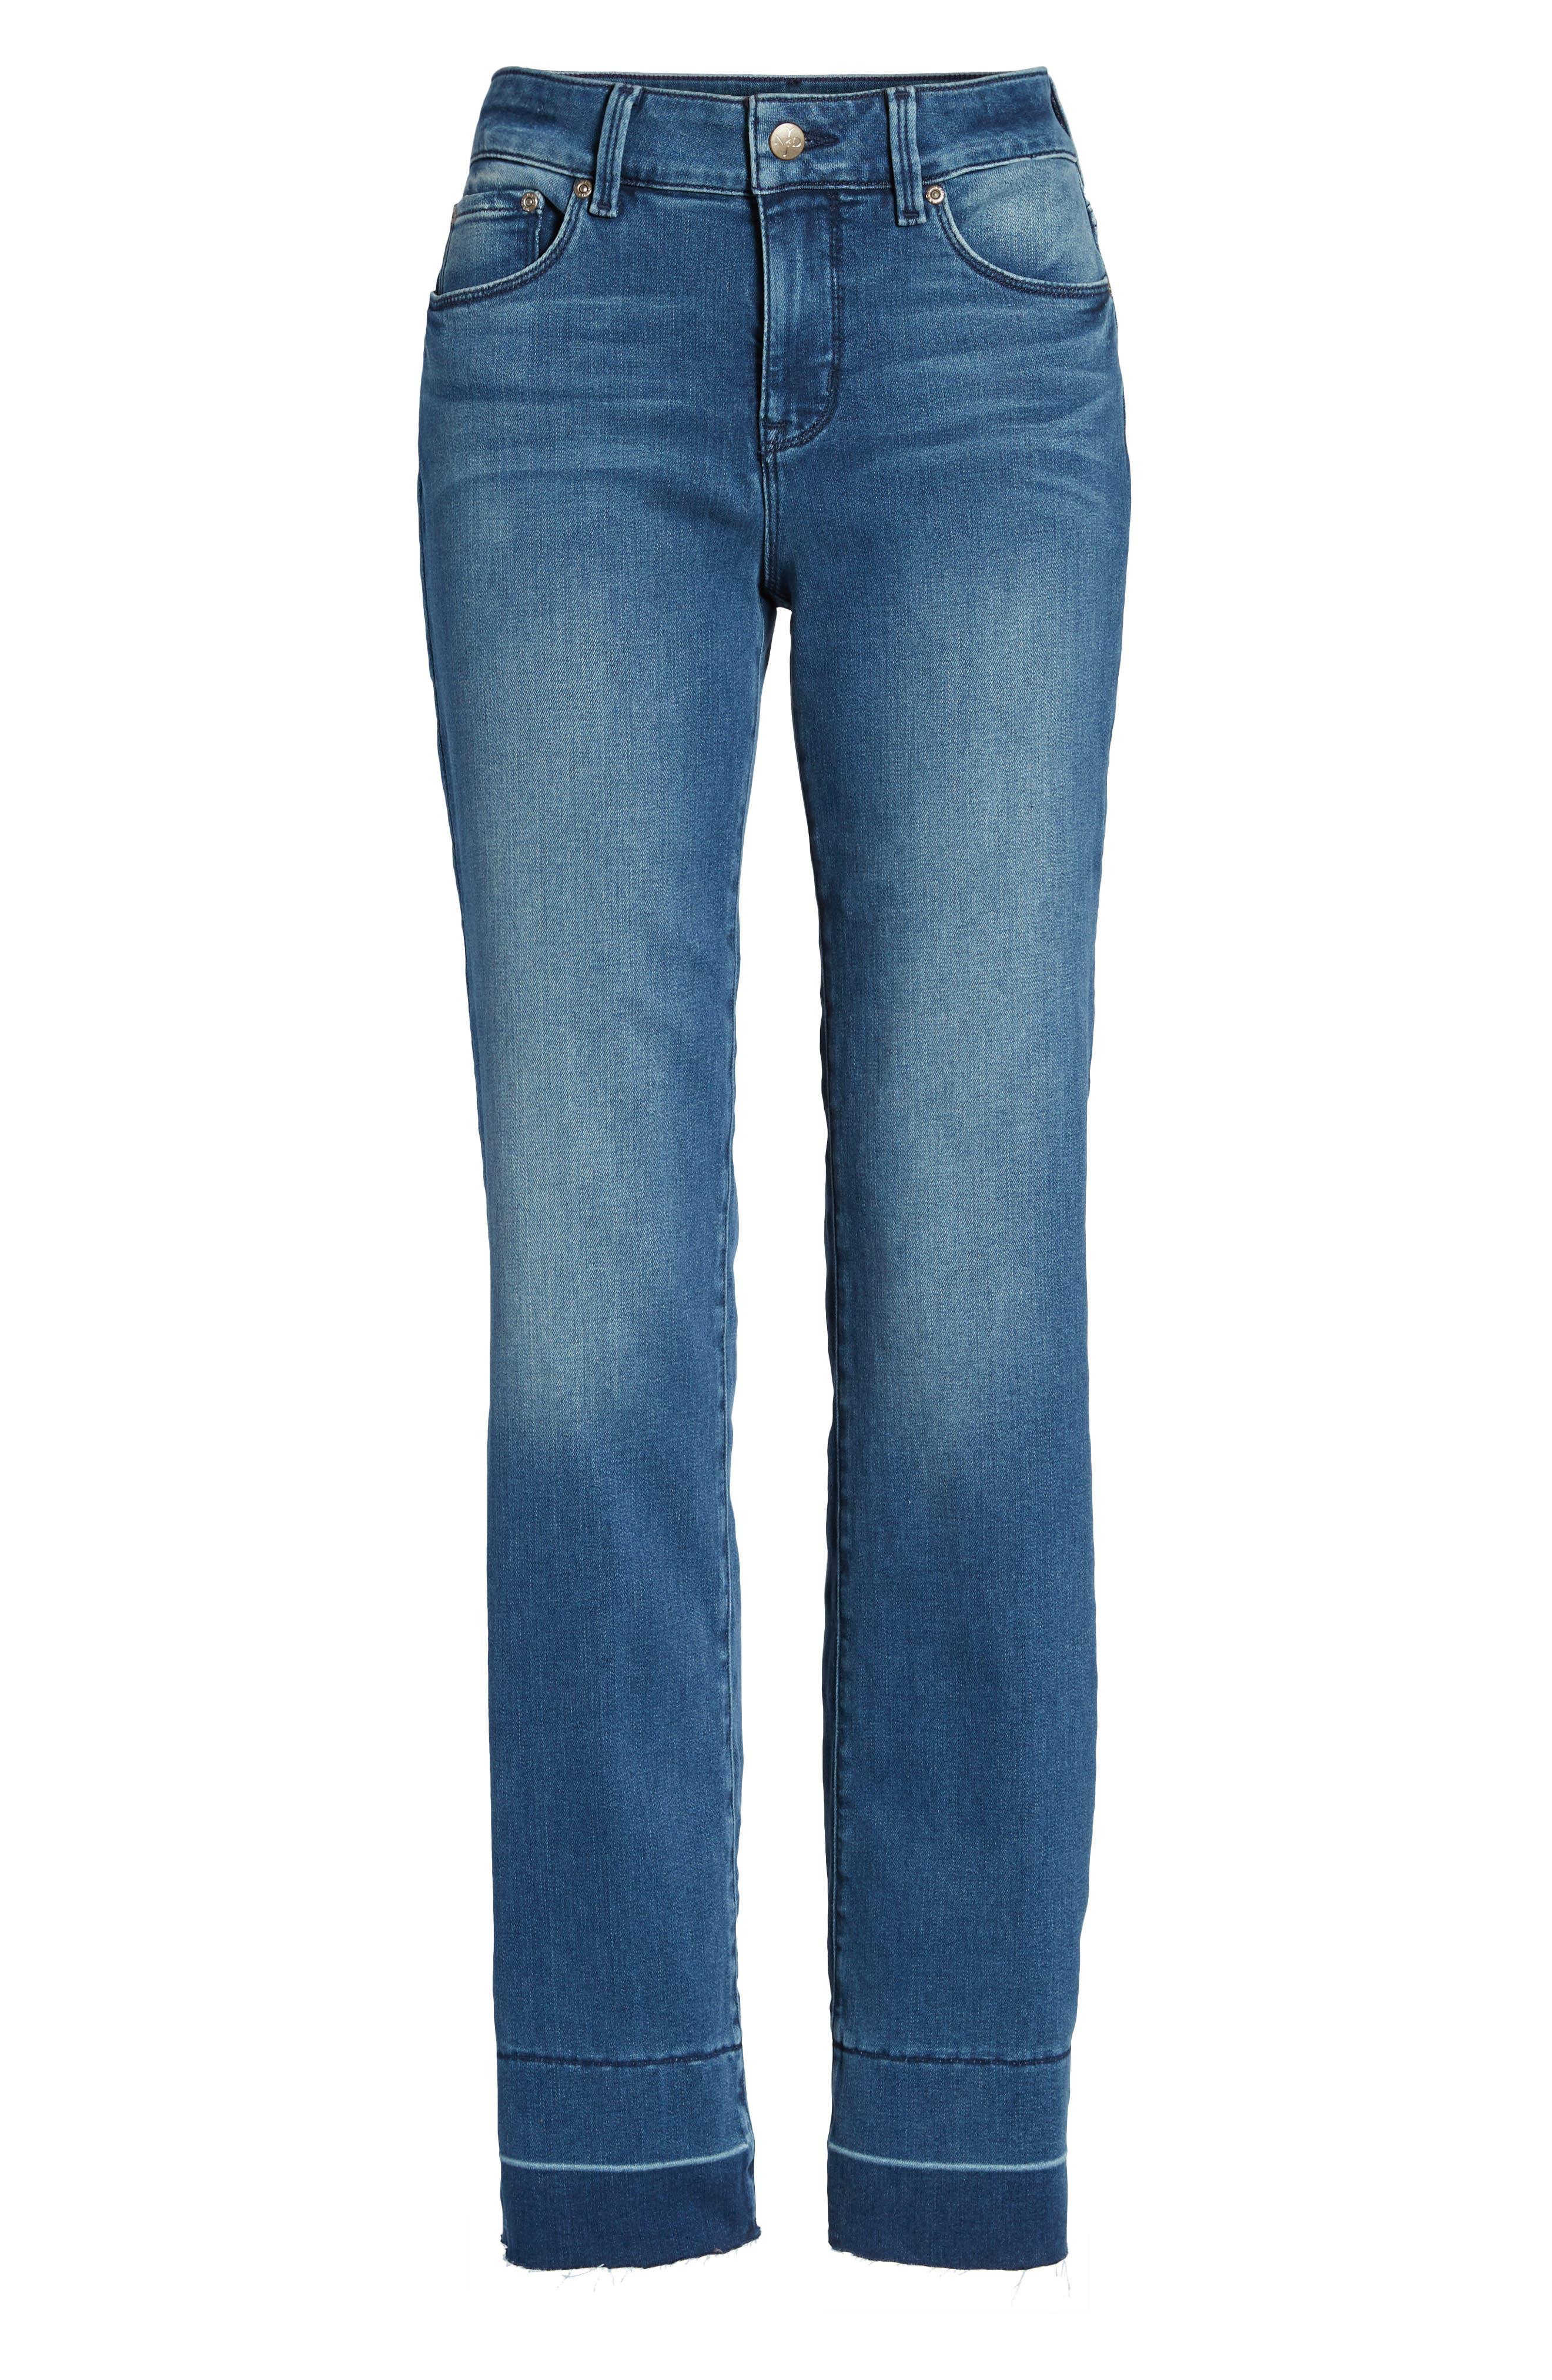 Marilyn Release Hem Stretch Straight Leg Jeans,                             Alternate thumbnail 7, color,                             410